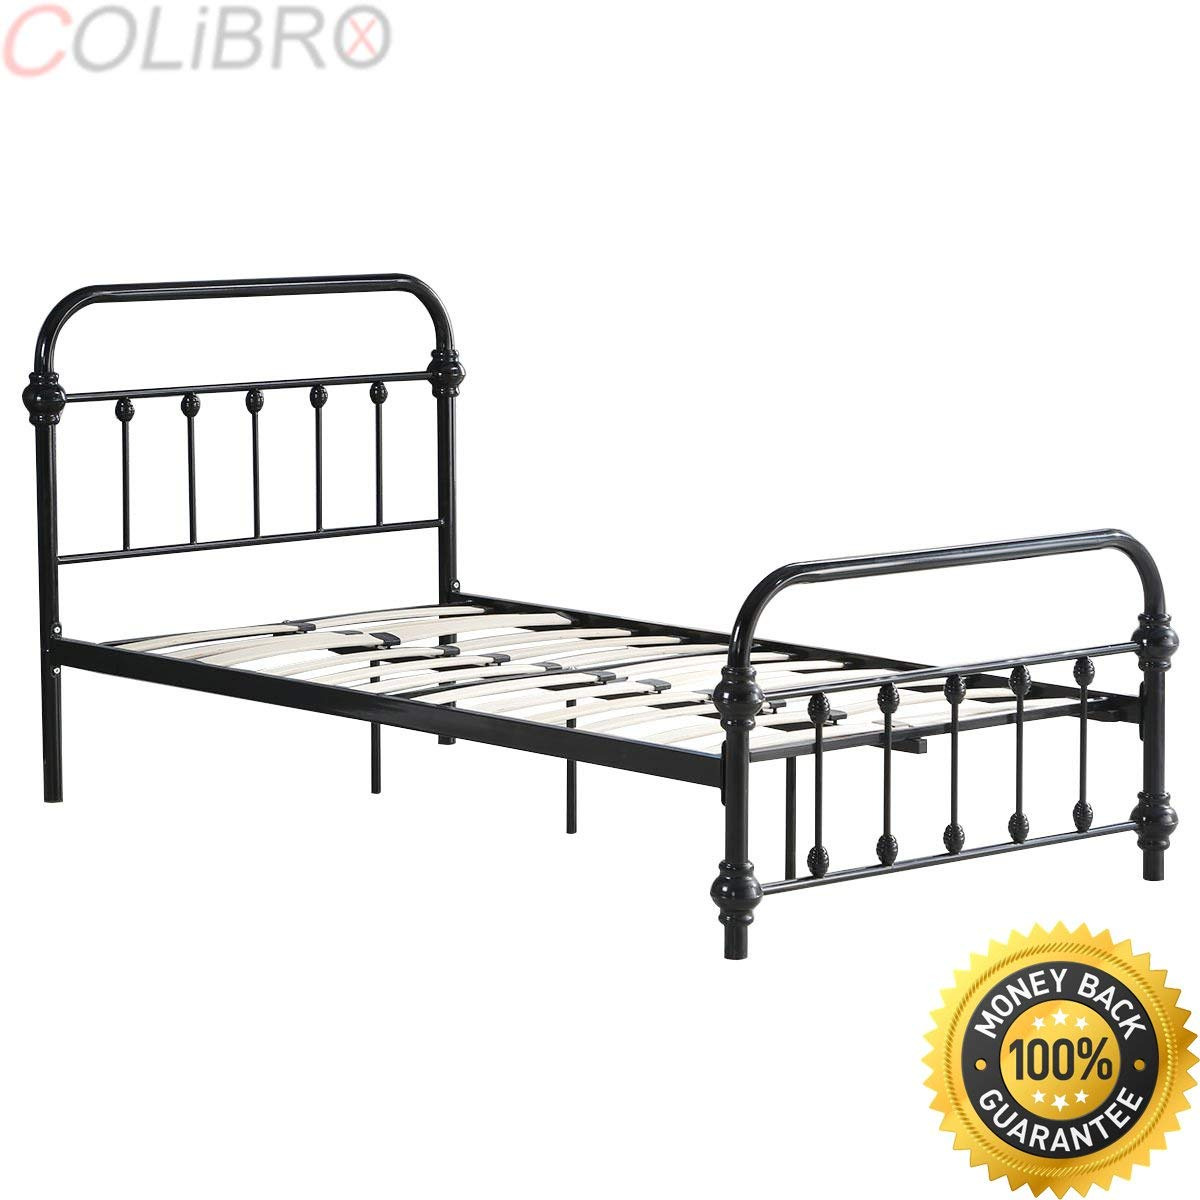 COLIBROX Twin Size Wood Slats Bed Frame Platform Support Headboard Footboard Furniture. adjustable bed frame for headboards and footboards queen. bed frame with headboard and footboard hooks.